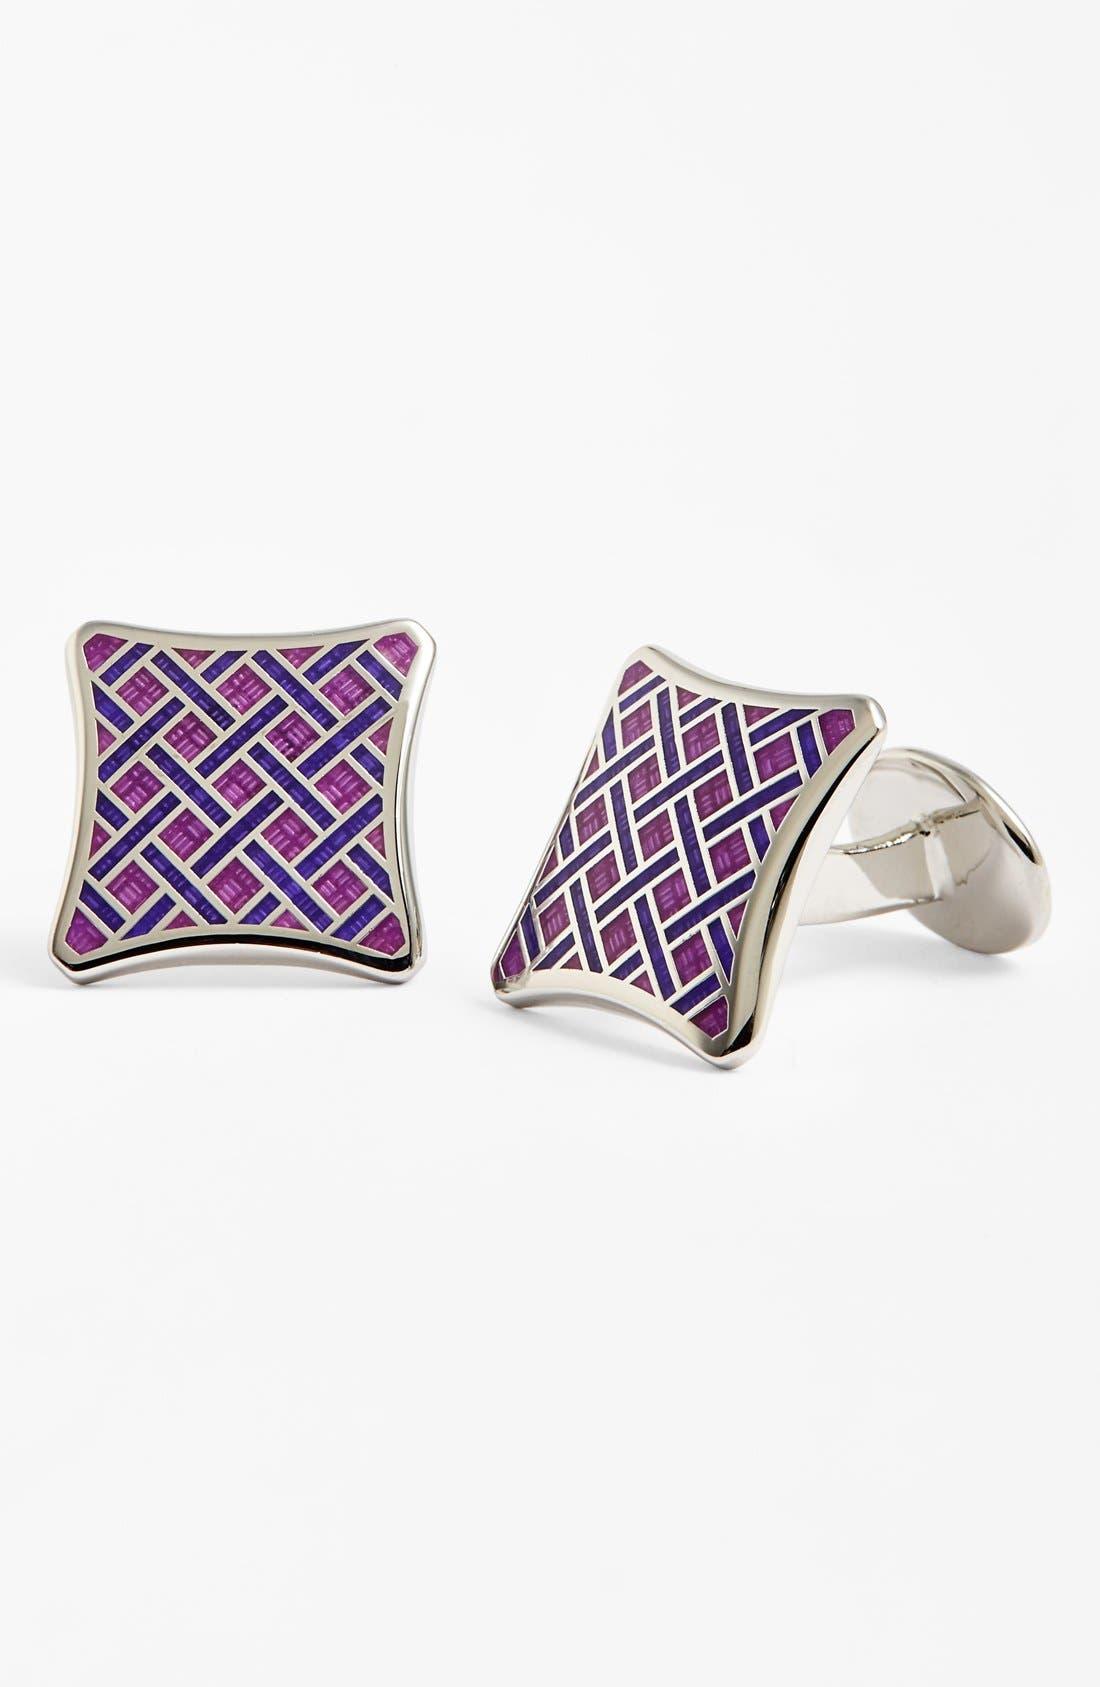 Sterling Silver Basketweave Cuff Links,                         Main,                         color, Silver/ Light Purple/ Violet